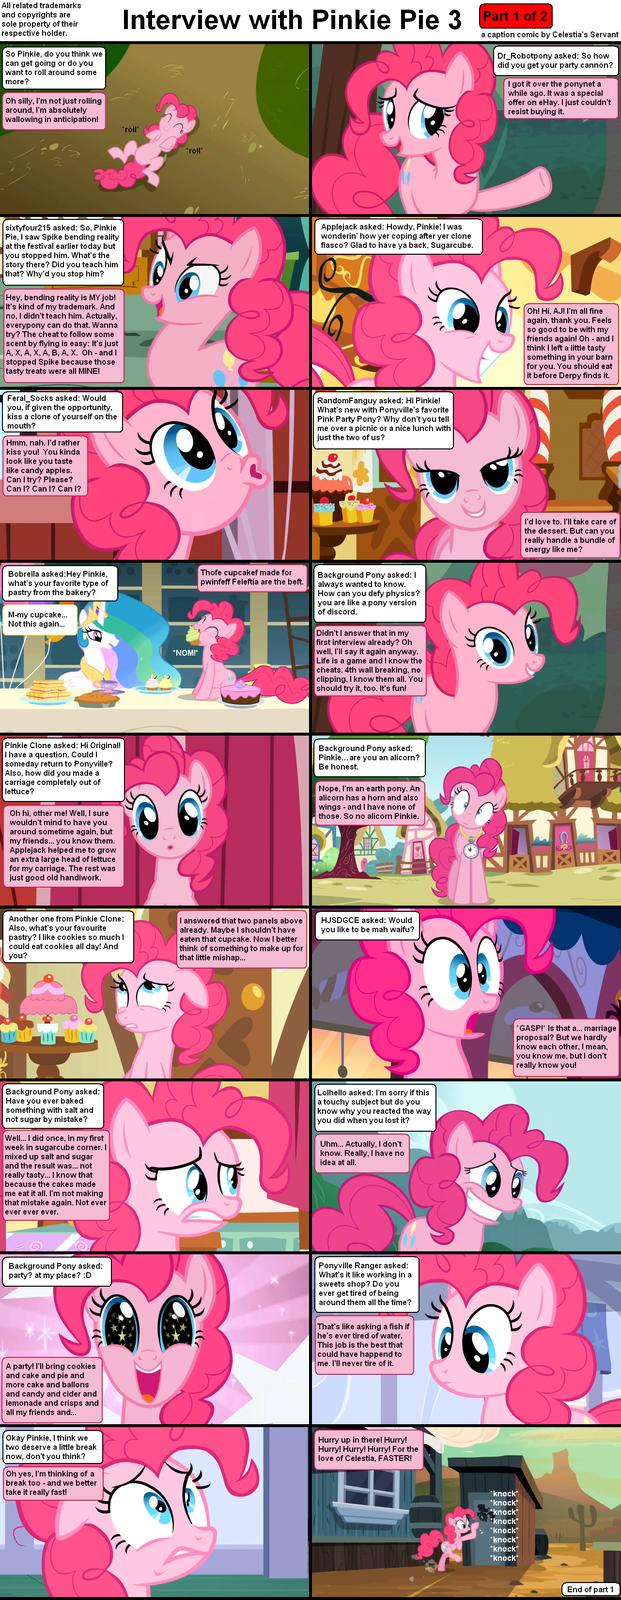 Interview with Pinkie Pie 3